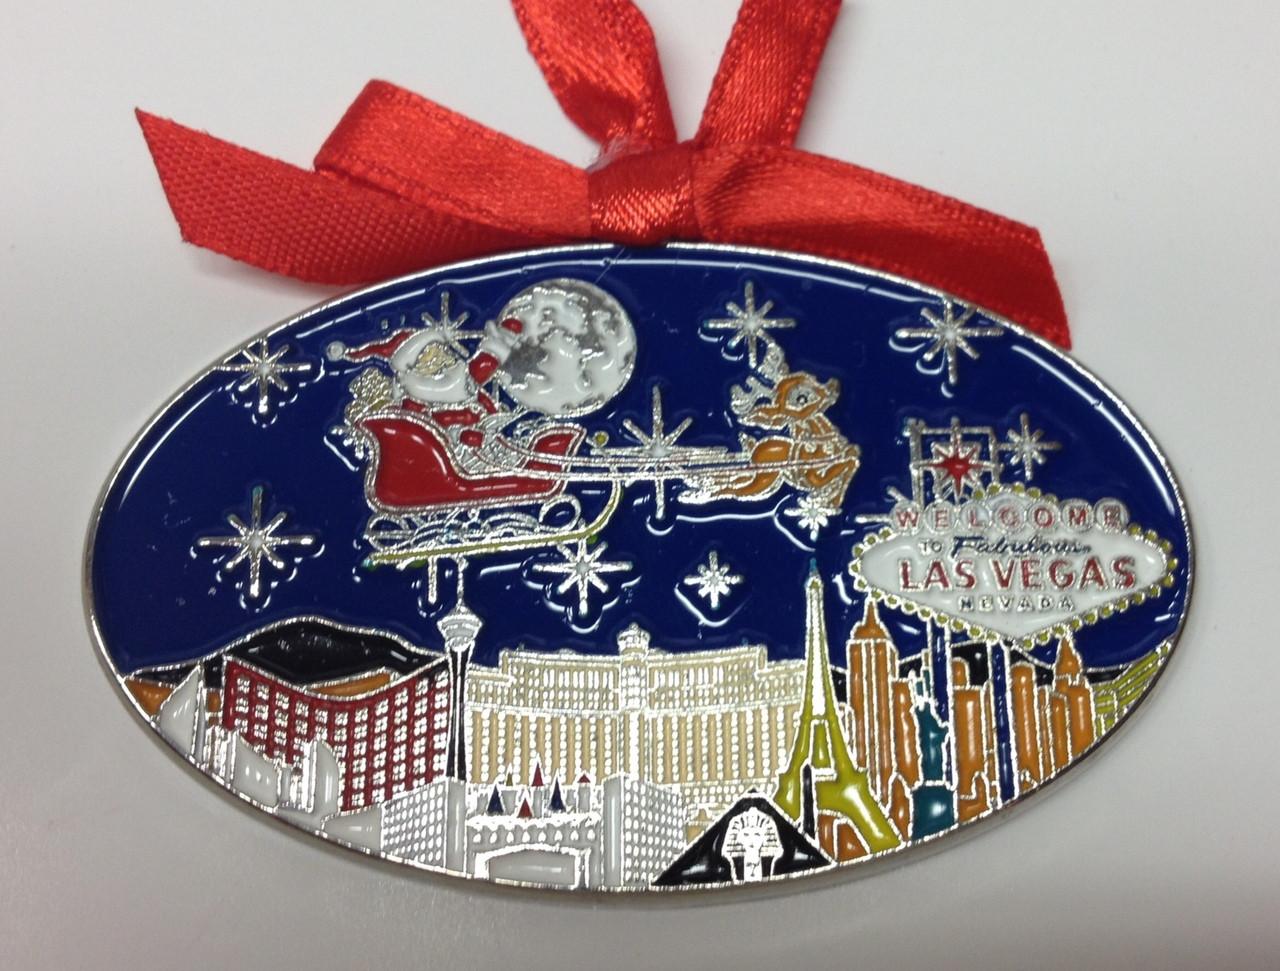 Las Vegas Sign Strip Hotels Christmas Tree Santa Sleigh